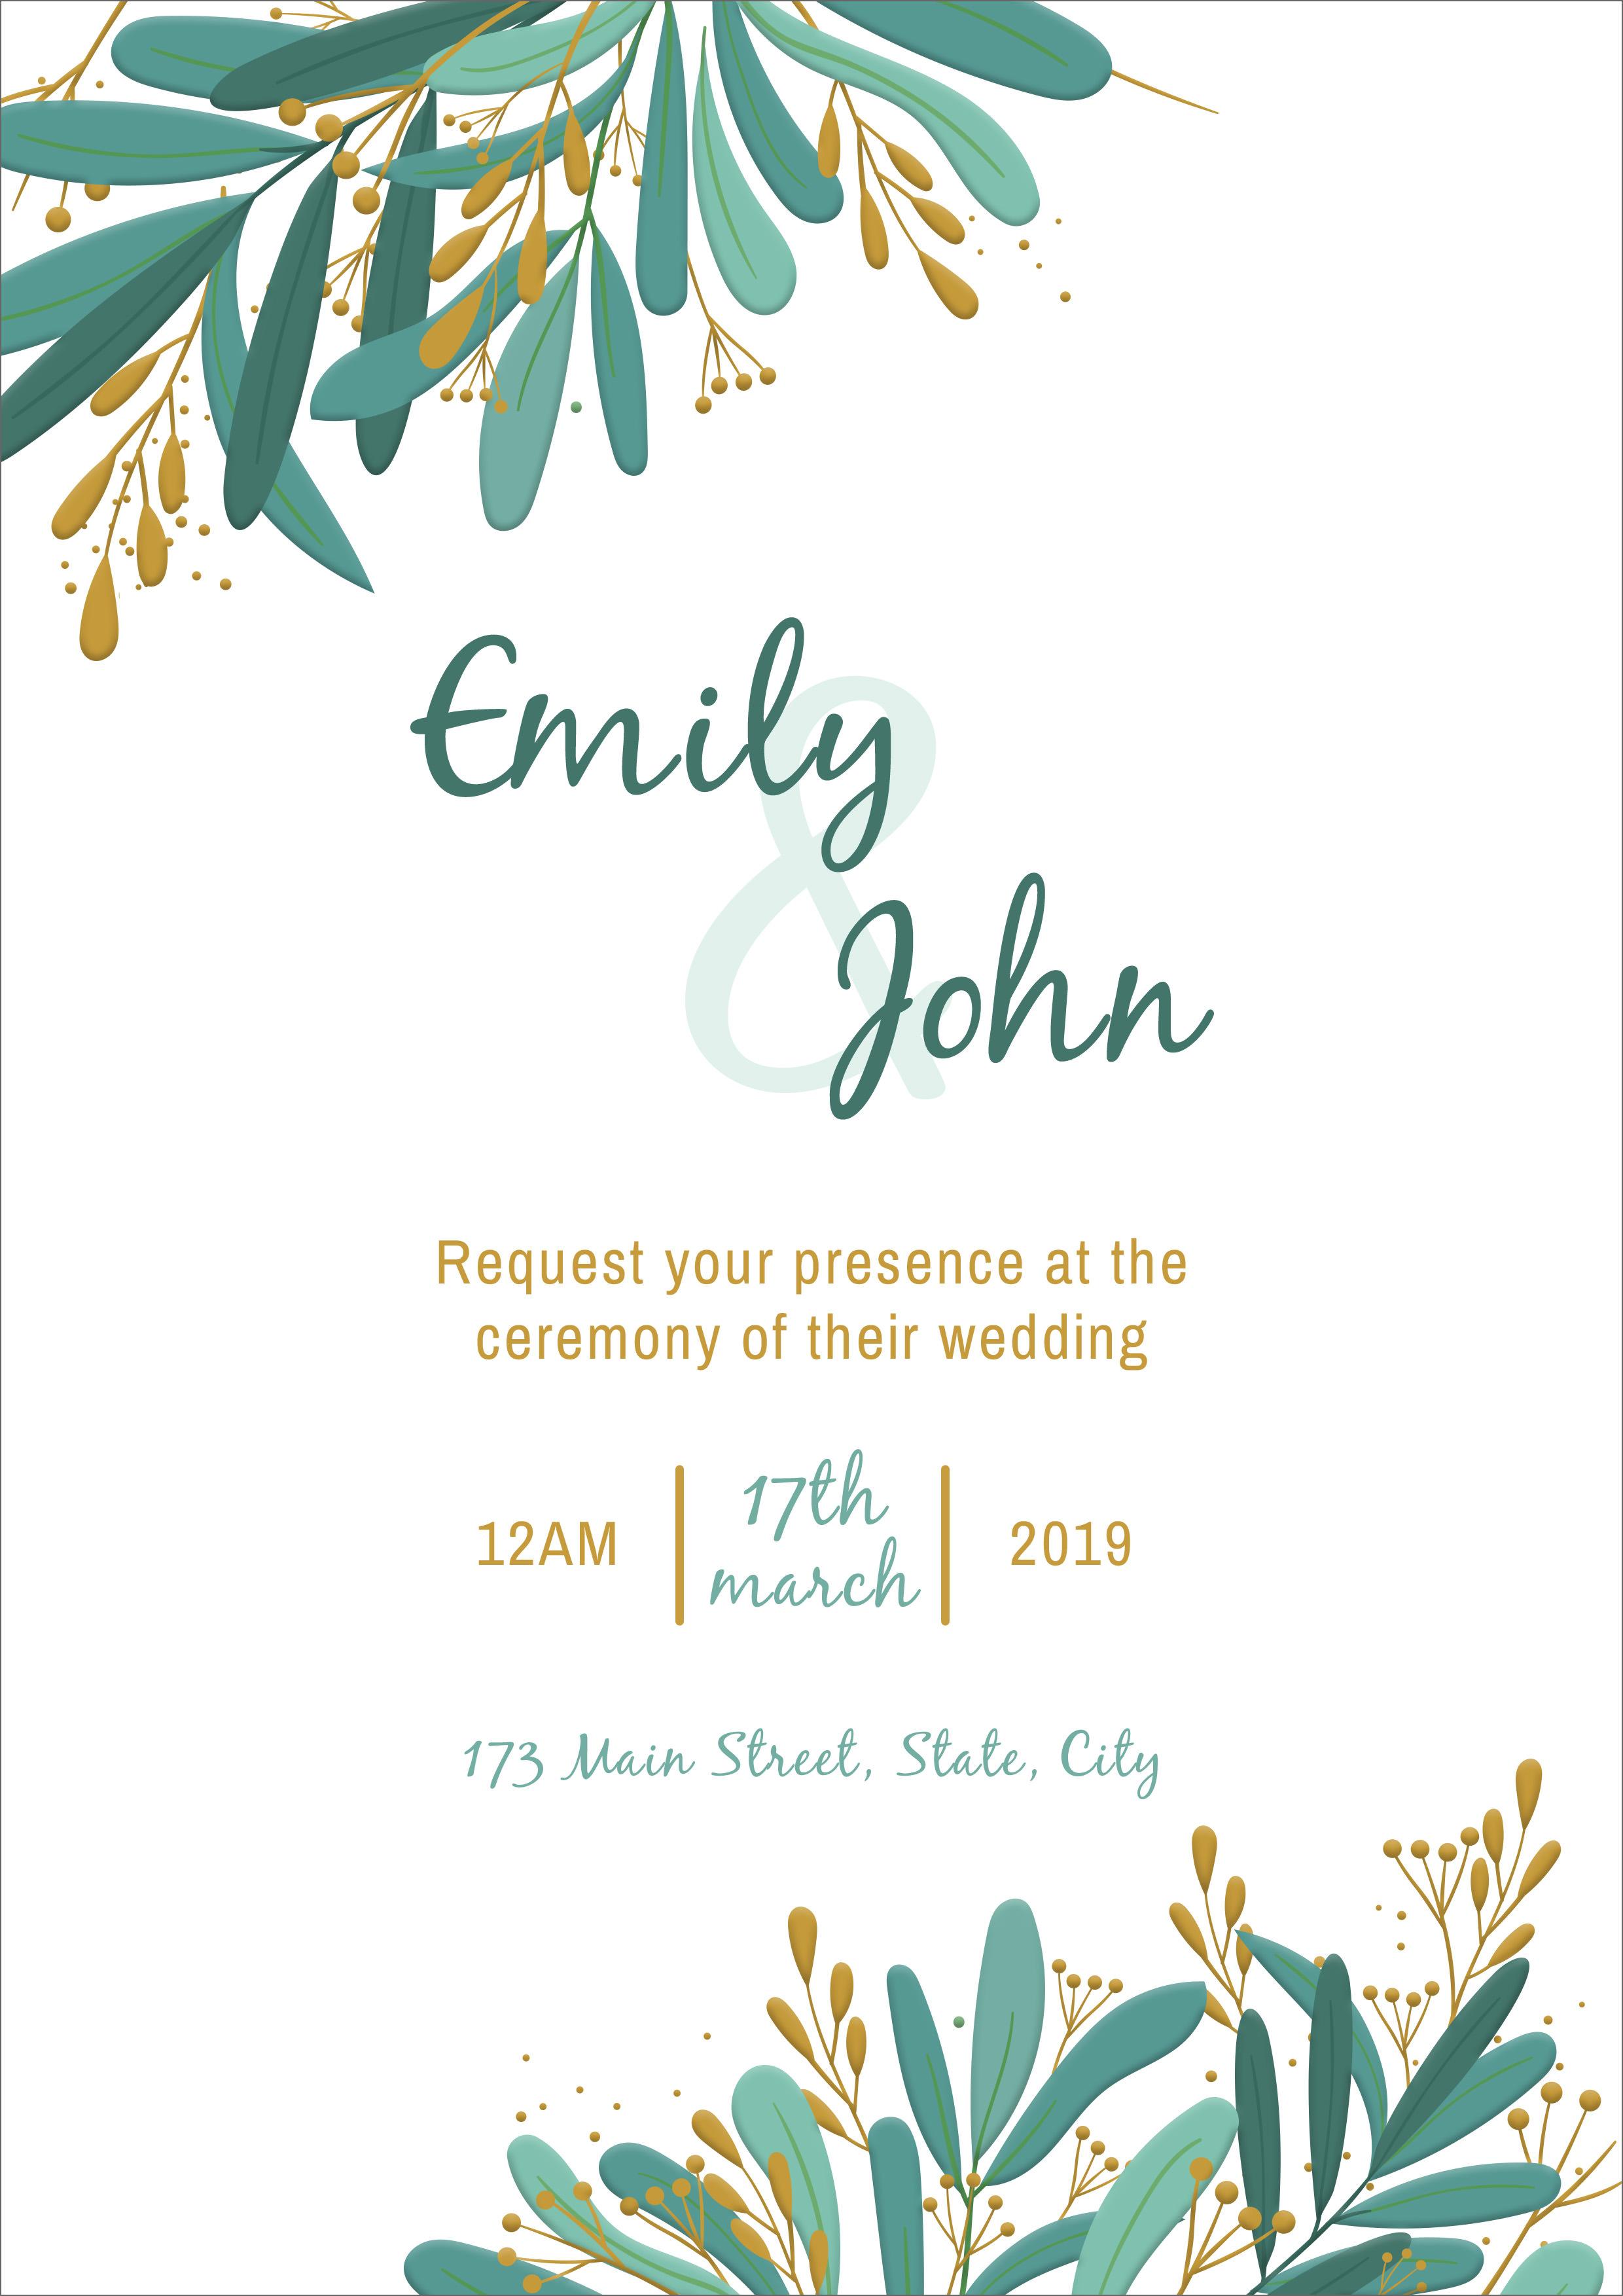 20 free wedding invitation template